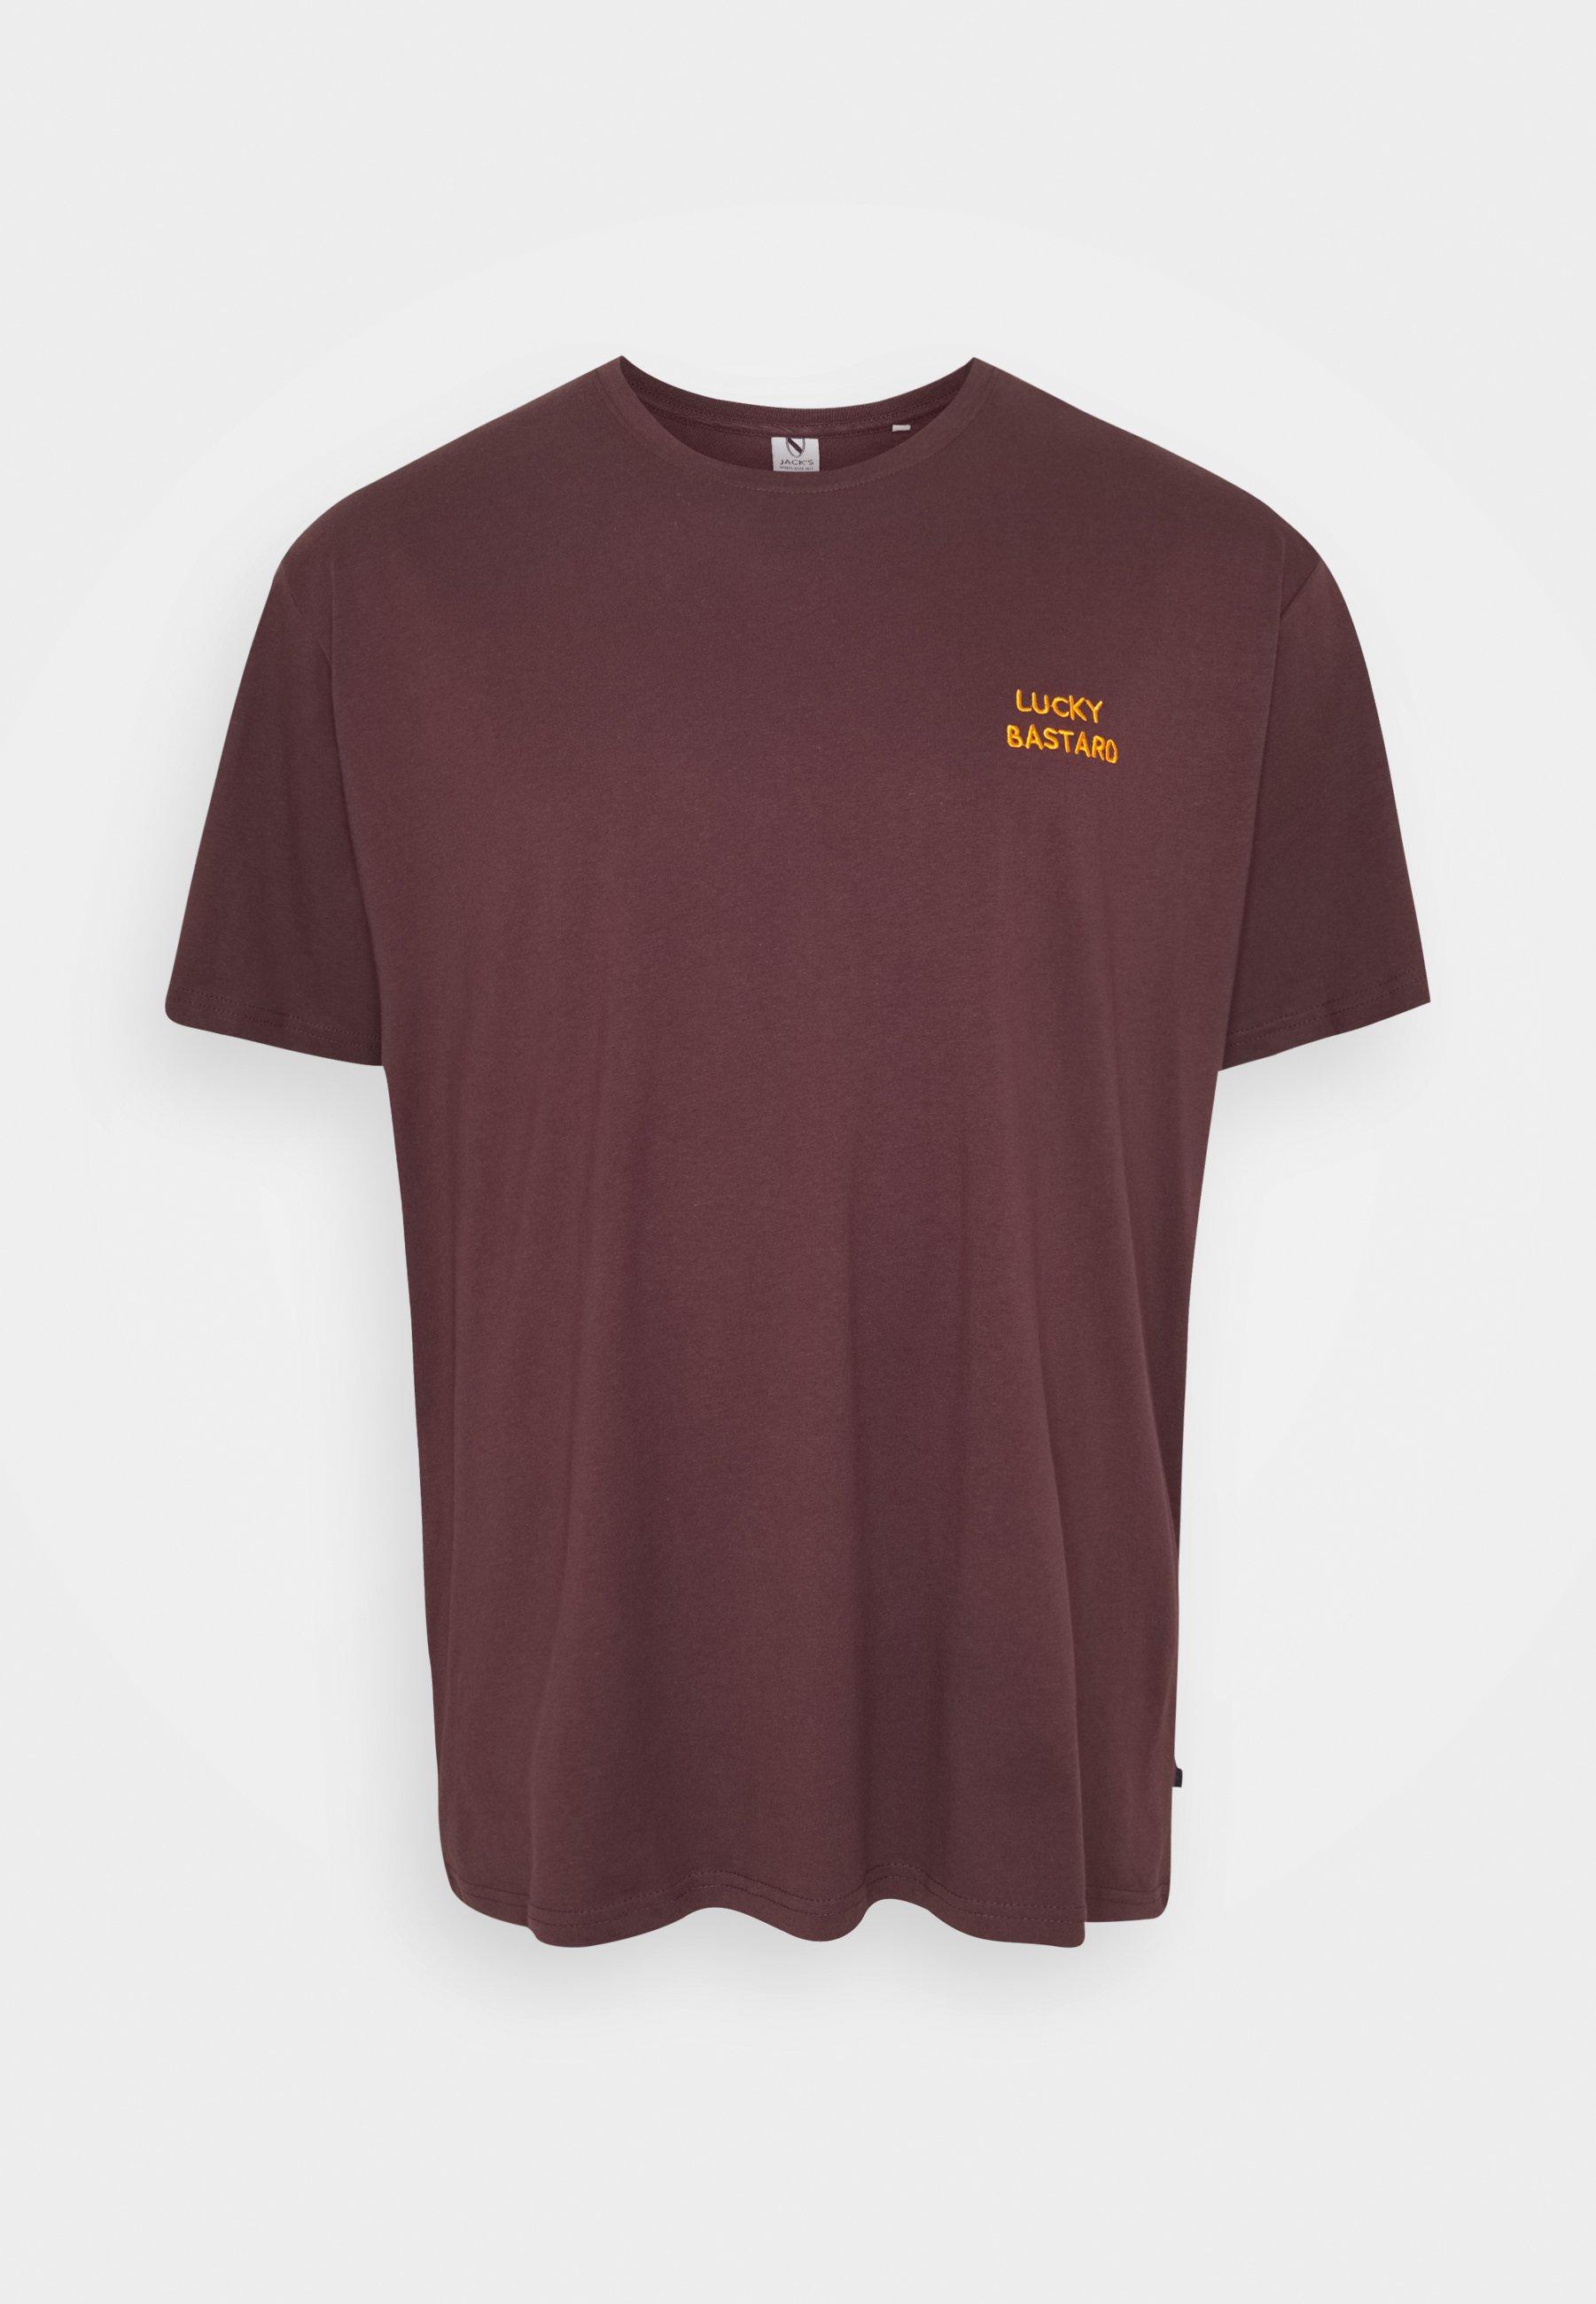 Jack´s Sportswear Chest Embroidery Tee - T-shirt Print Black